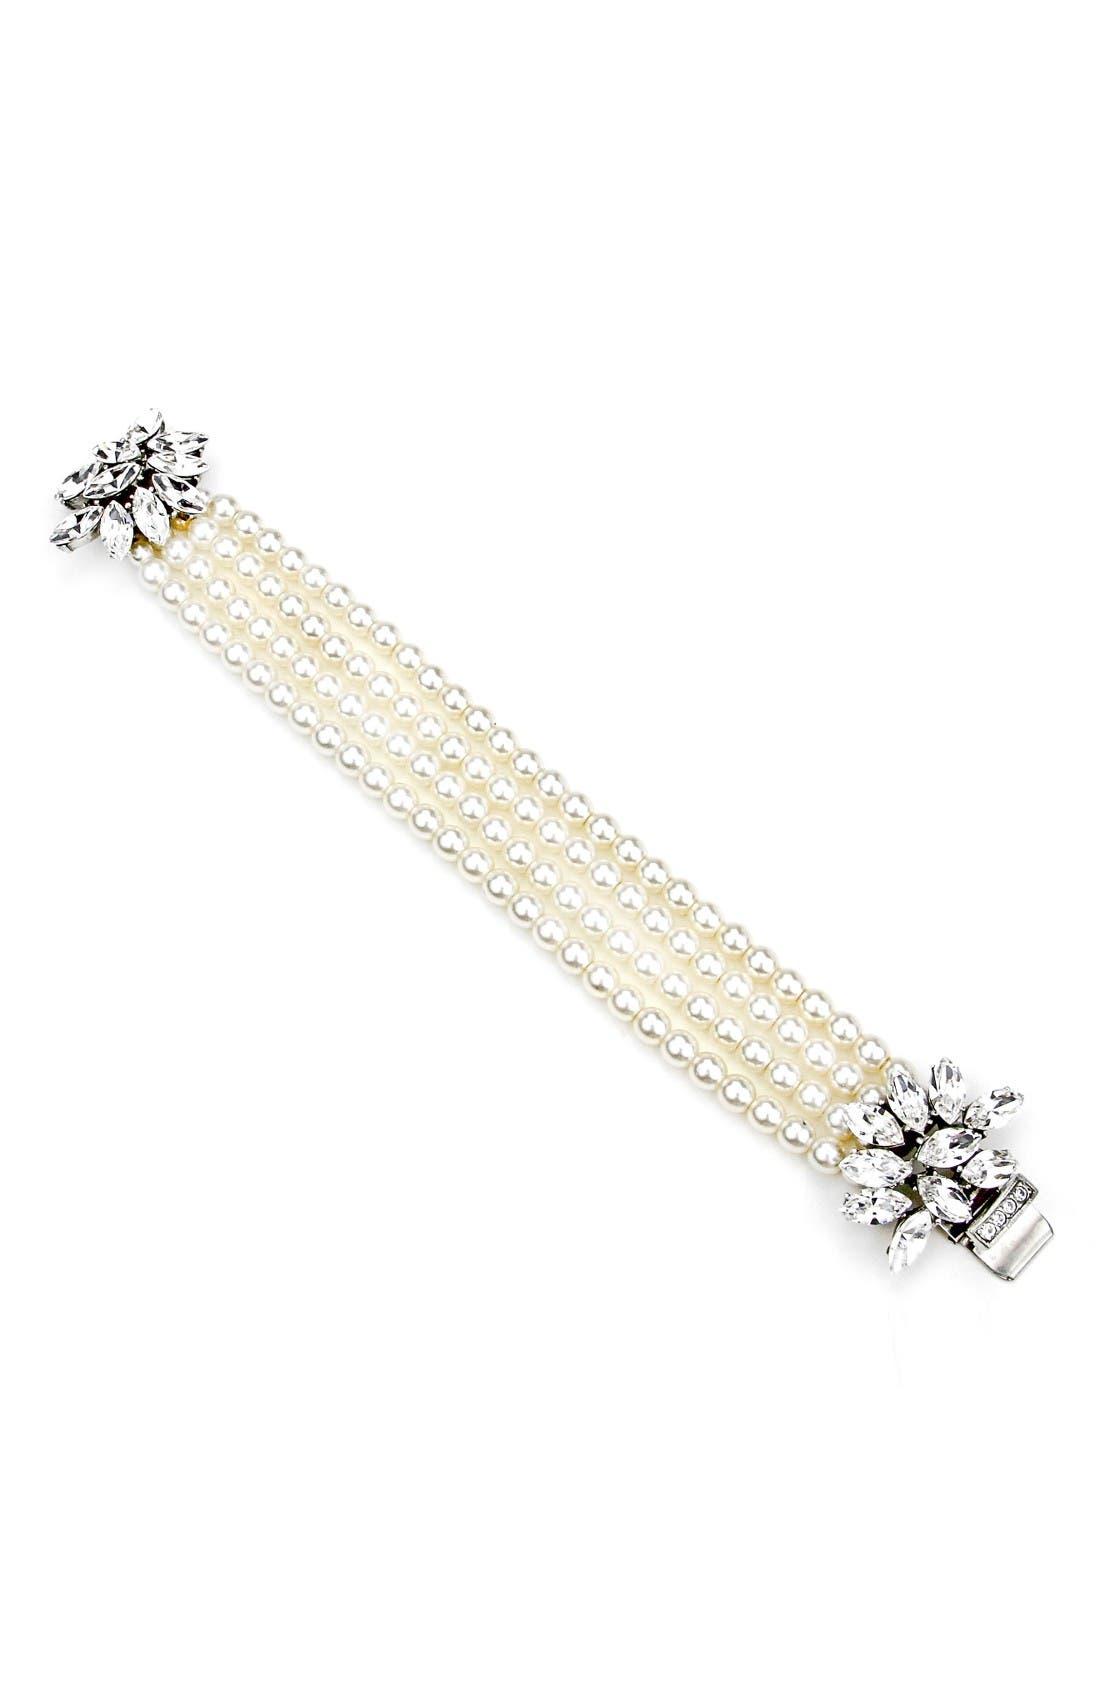 Main Image - BEN-AMUN Cascading Crystals Faux Pearl Bracelet